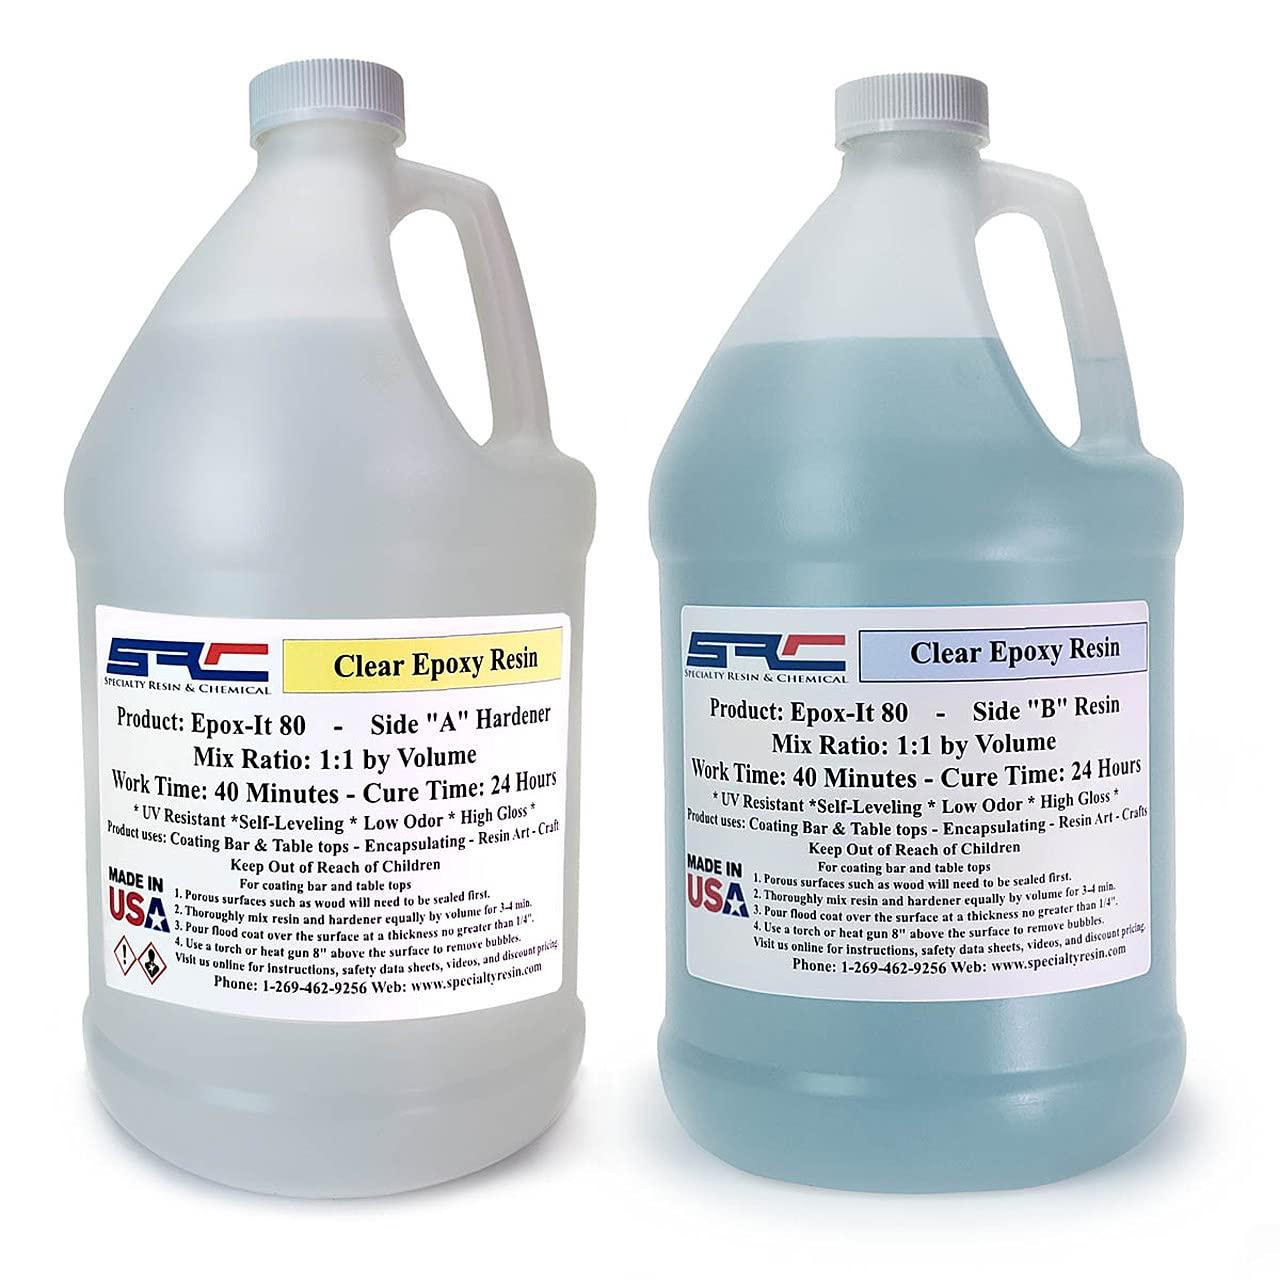 Epox-It 80 Clear Epoxy Resin for Coating Wood